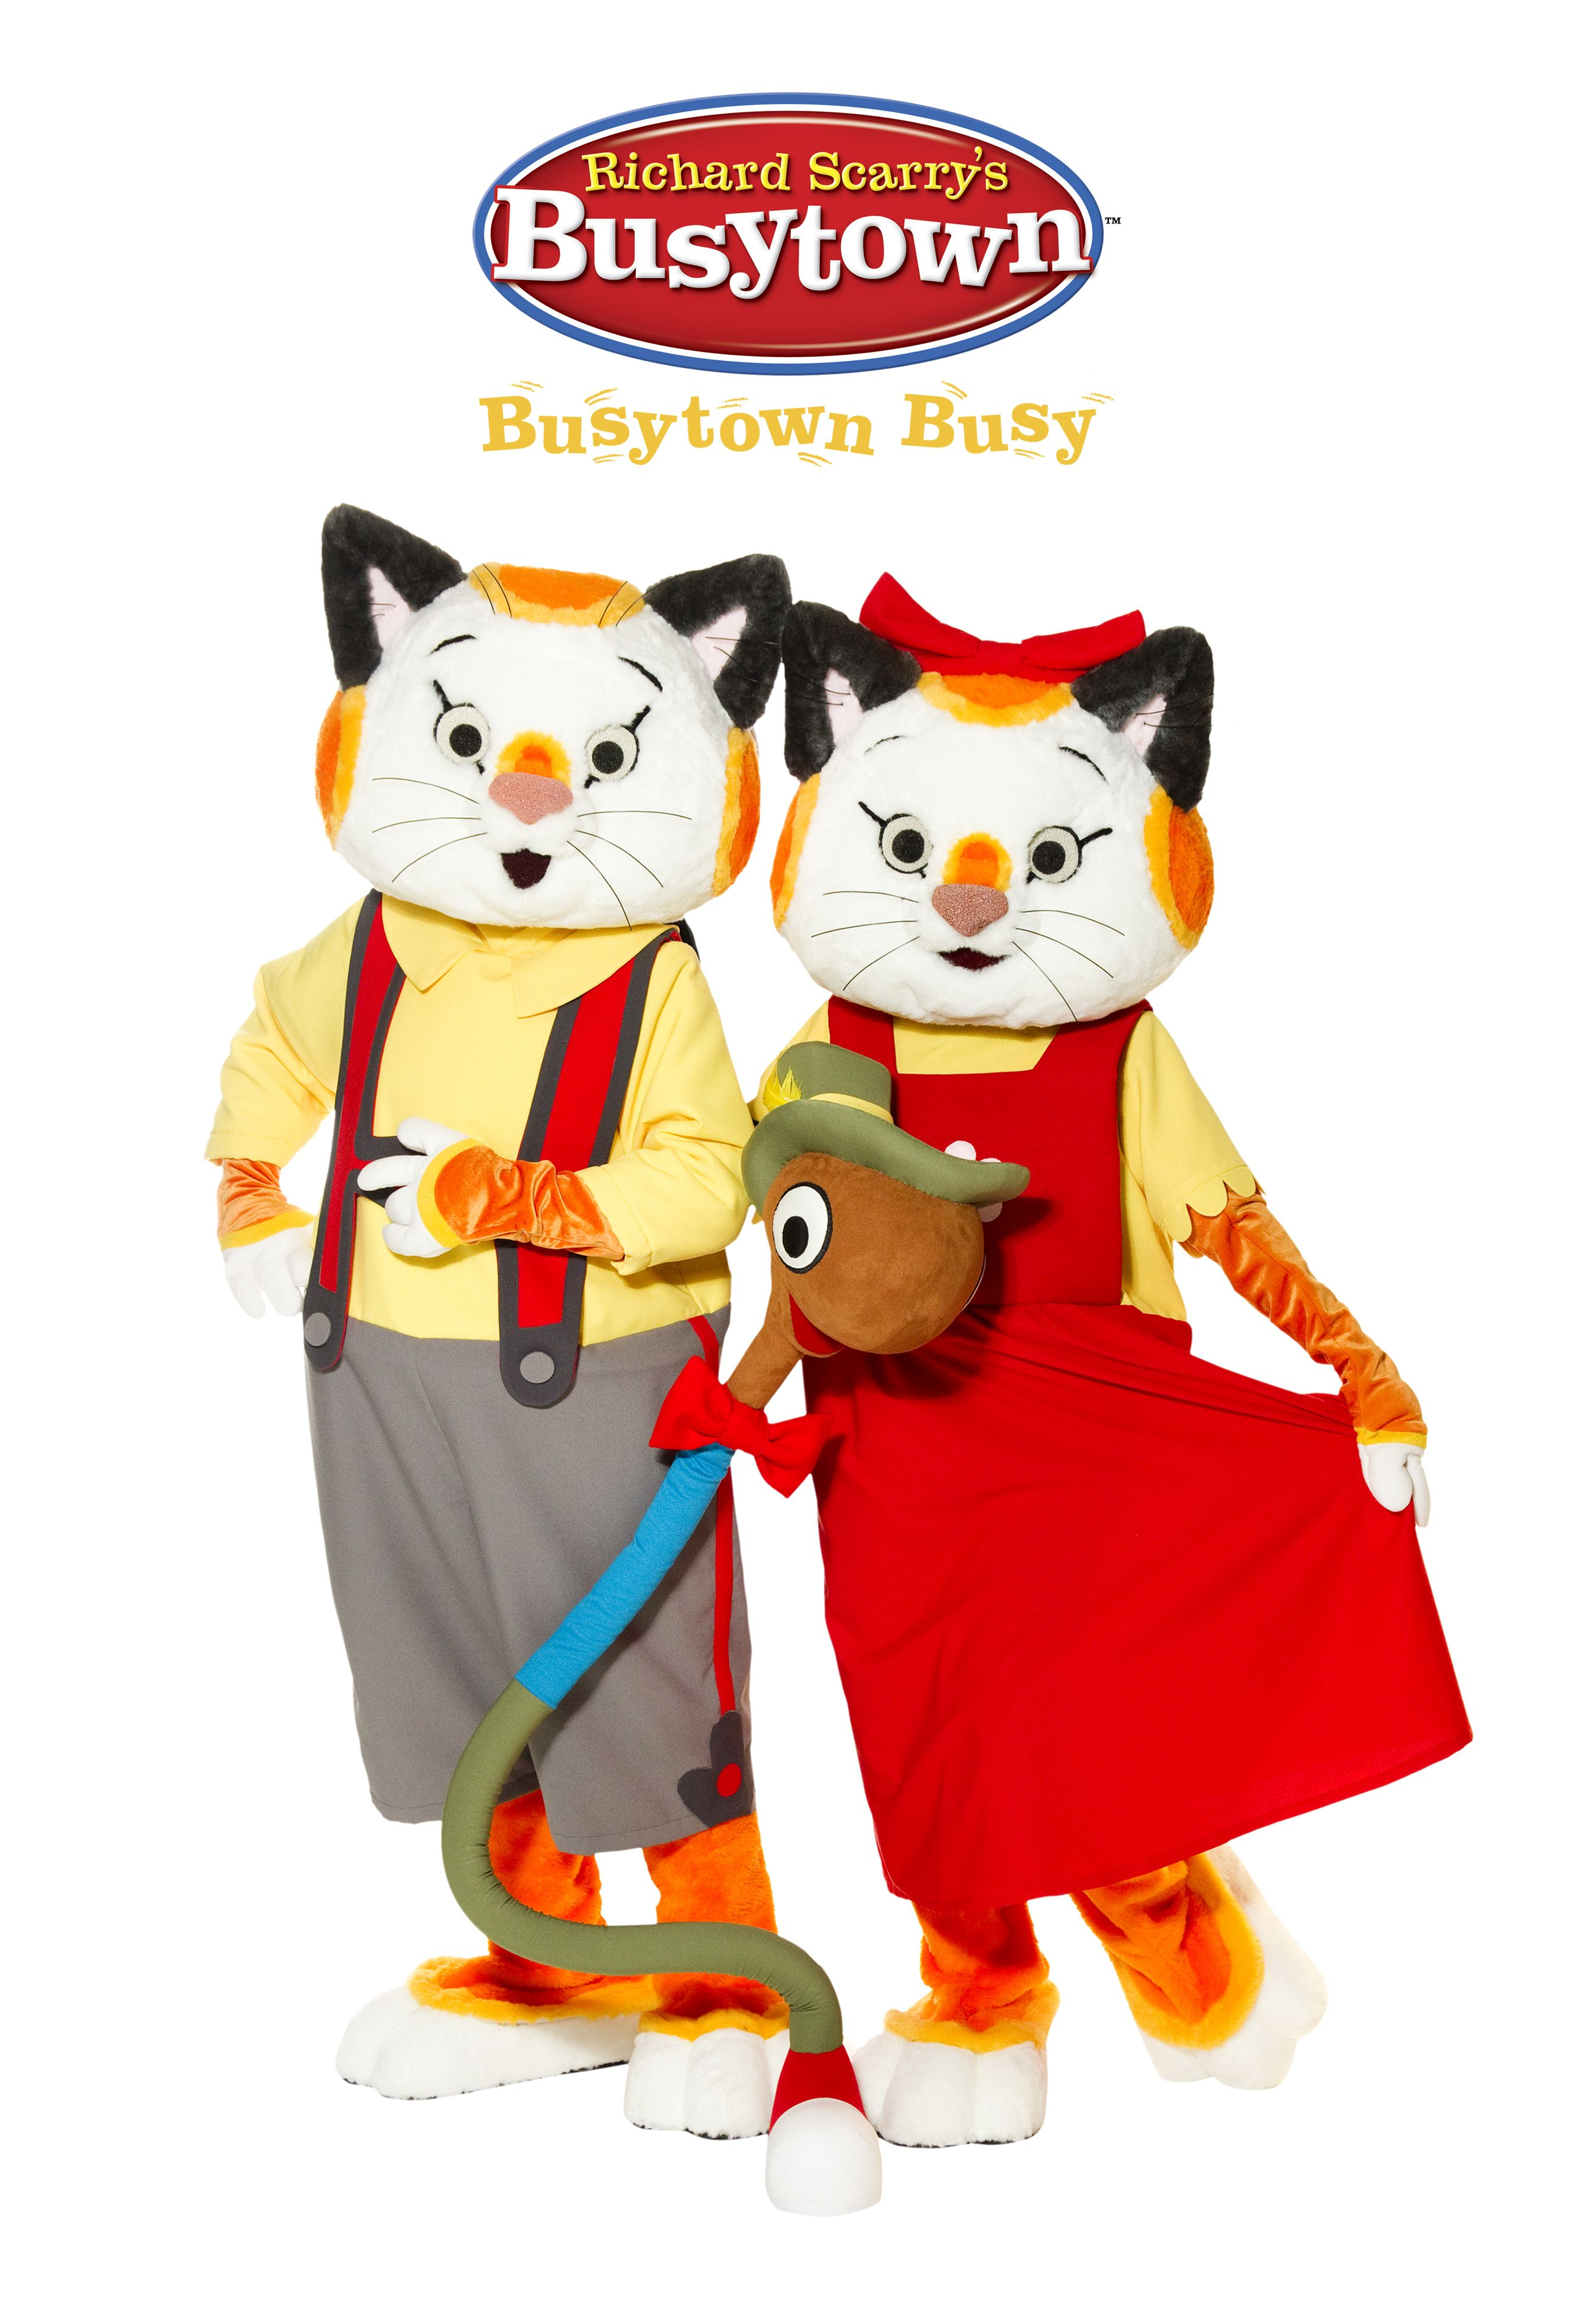 RichardScarry Busytown Live KobaEntertainment Cats